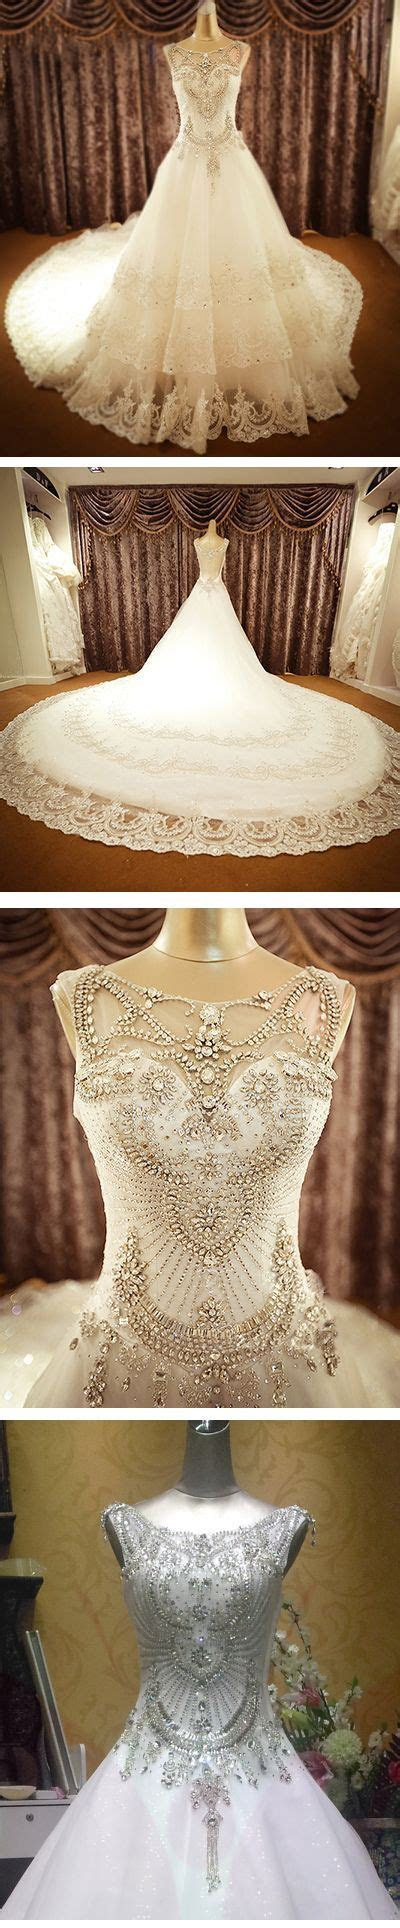 25  best ideas about Crystal wedding dresses on Pinterest